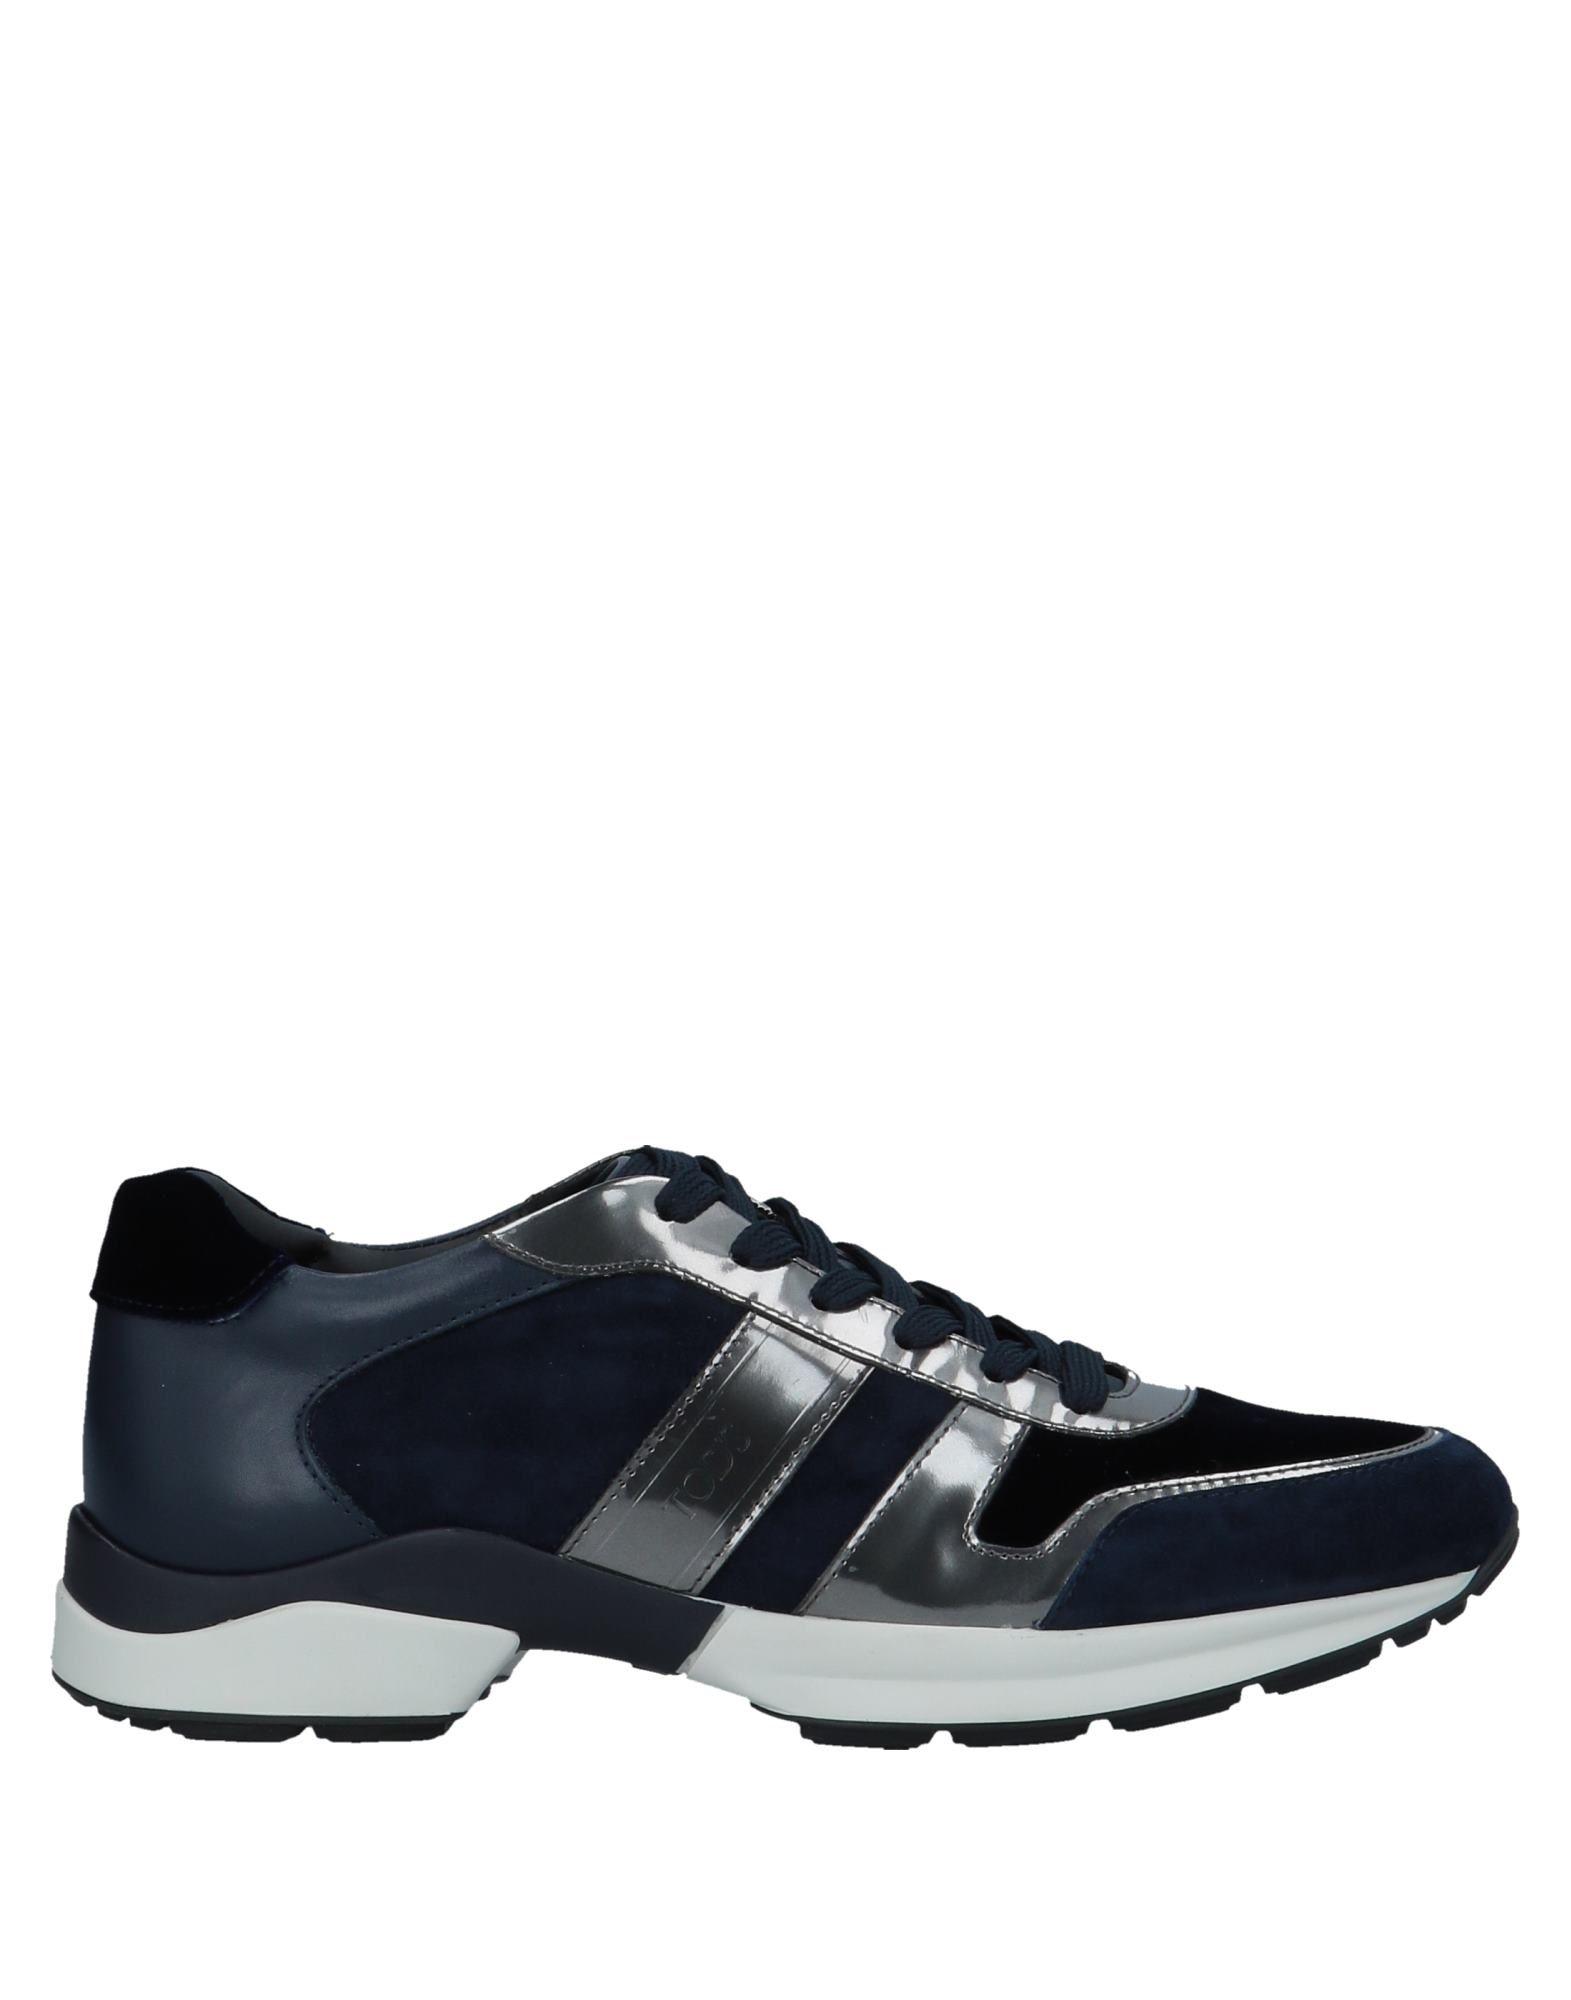 Rabatt Schuhe Tod's Sneakers Damen  11542123FI